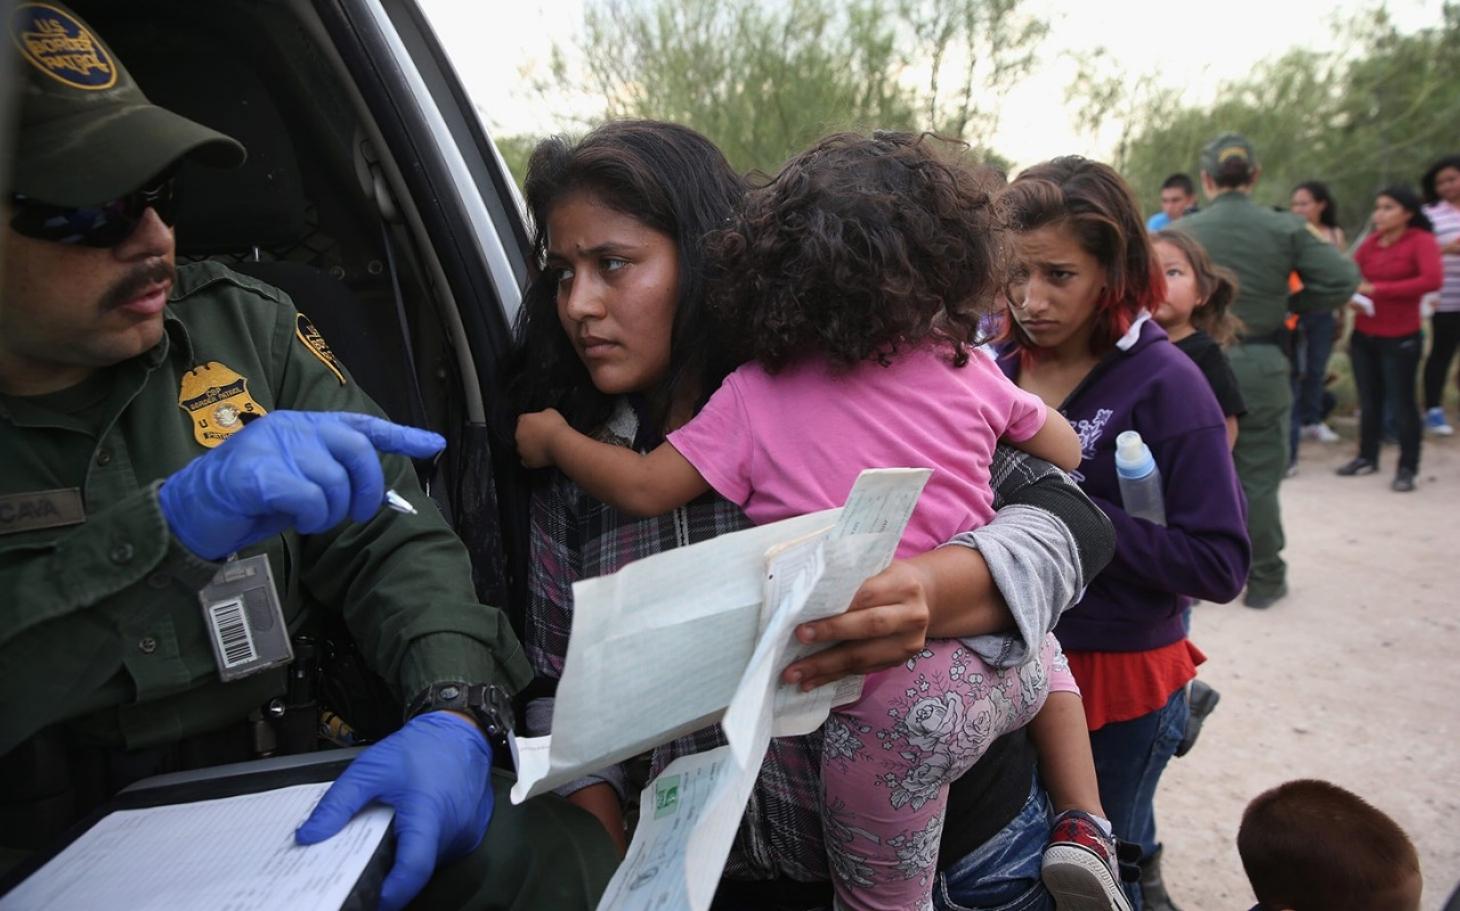 Illegal Caravans Encouraged by Honduras and Soros